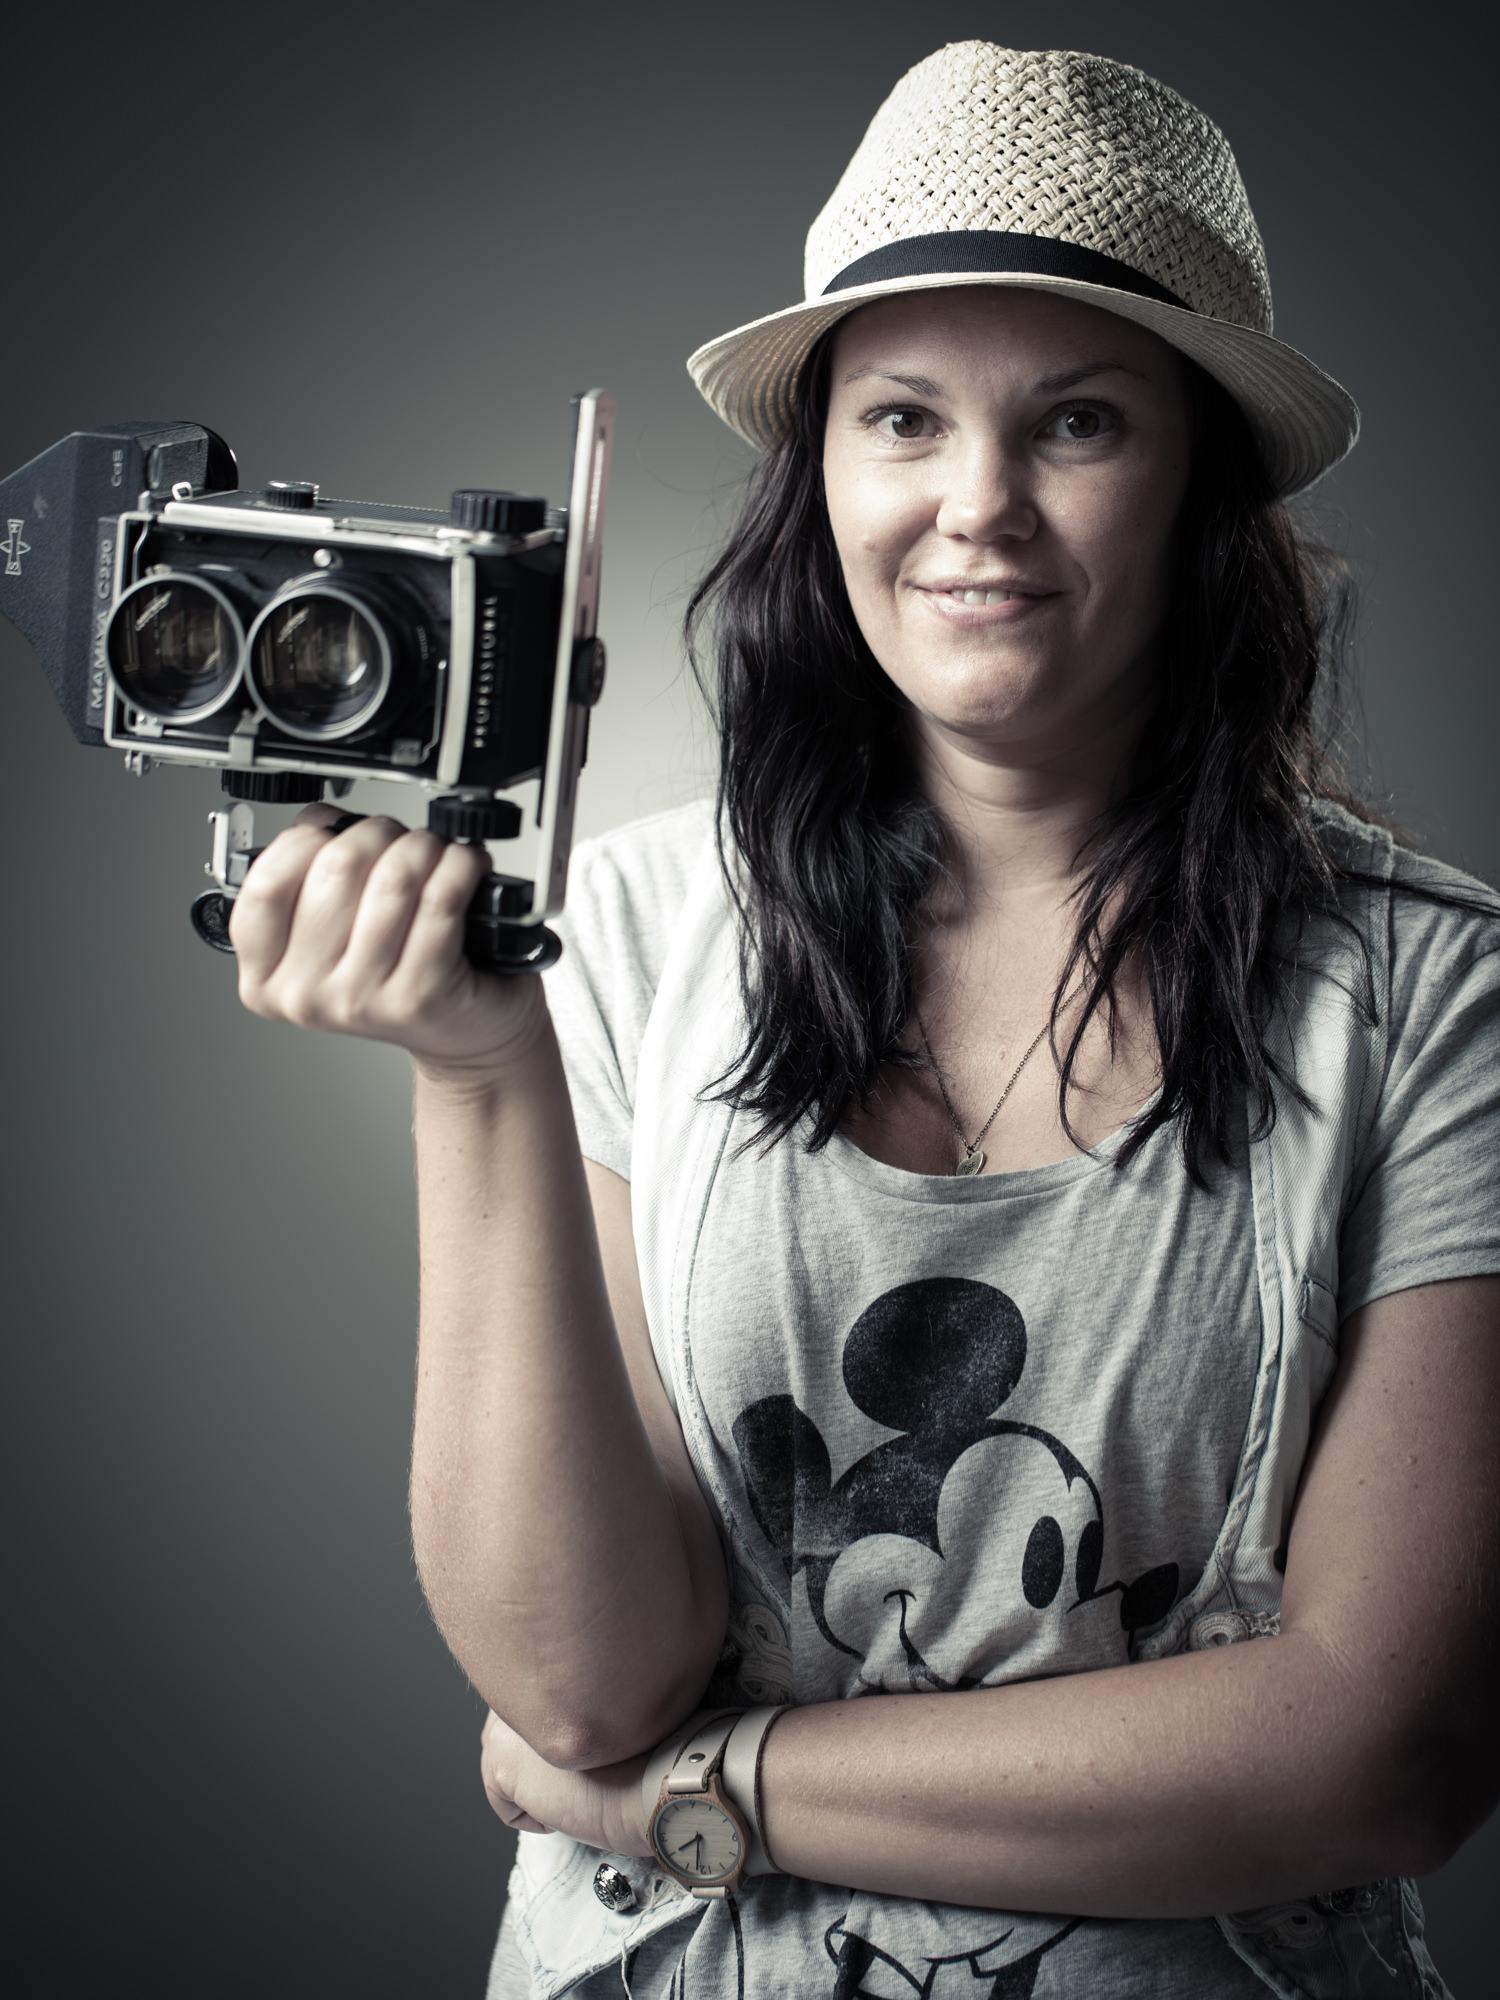 tim gerges portrait photographer portrait day-2977.jpg